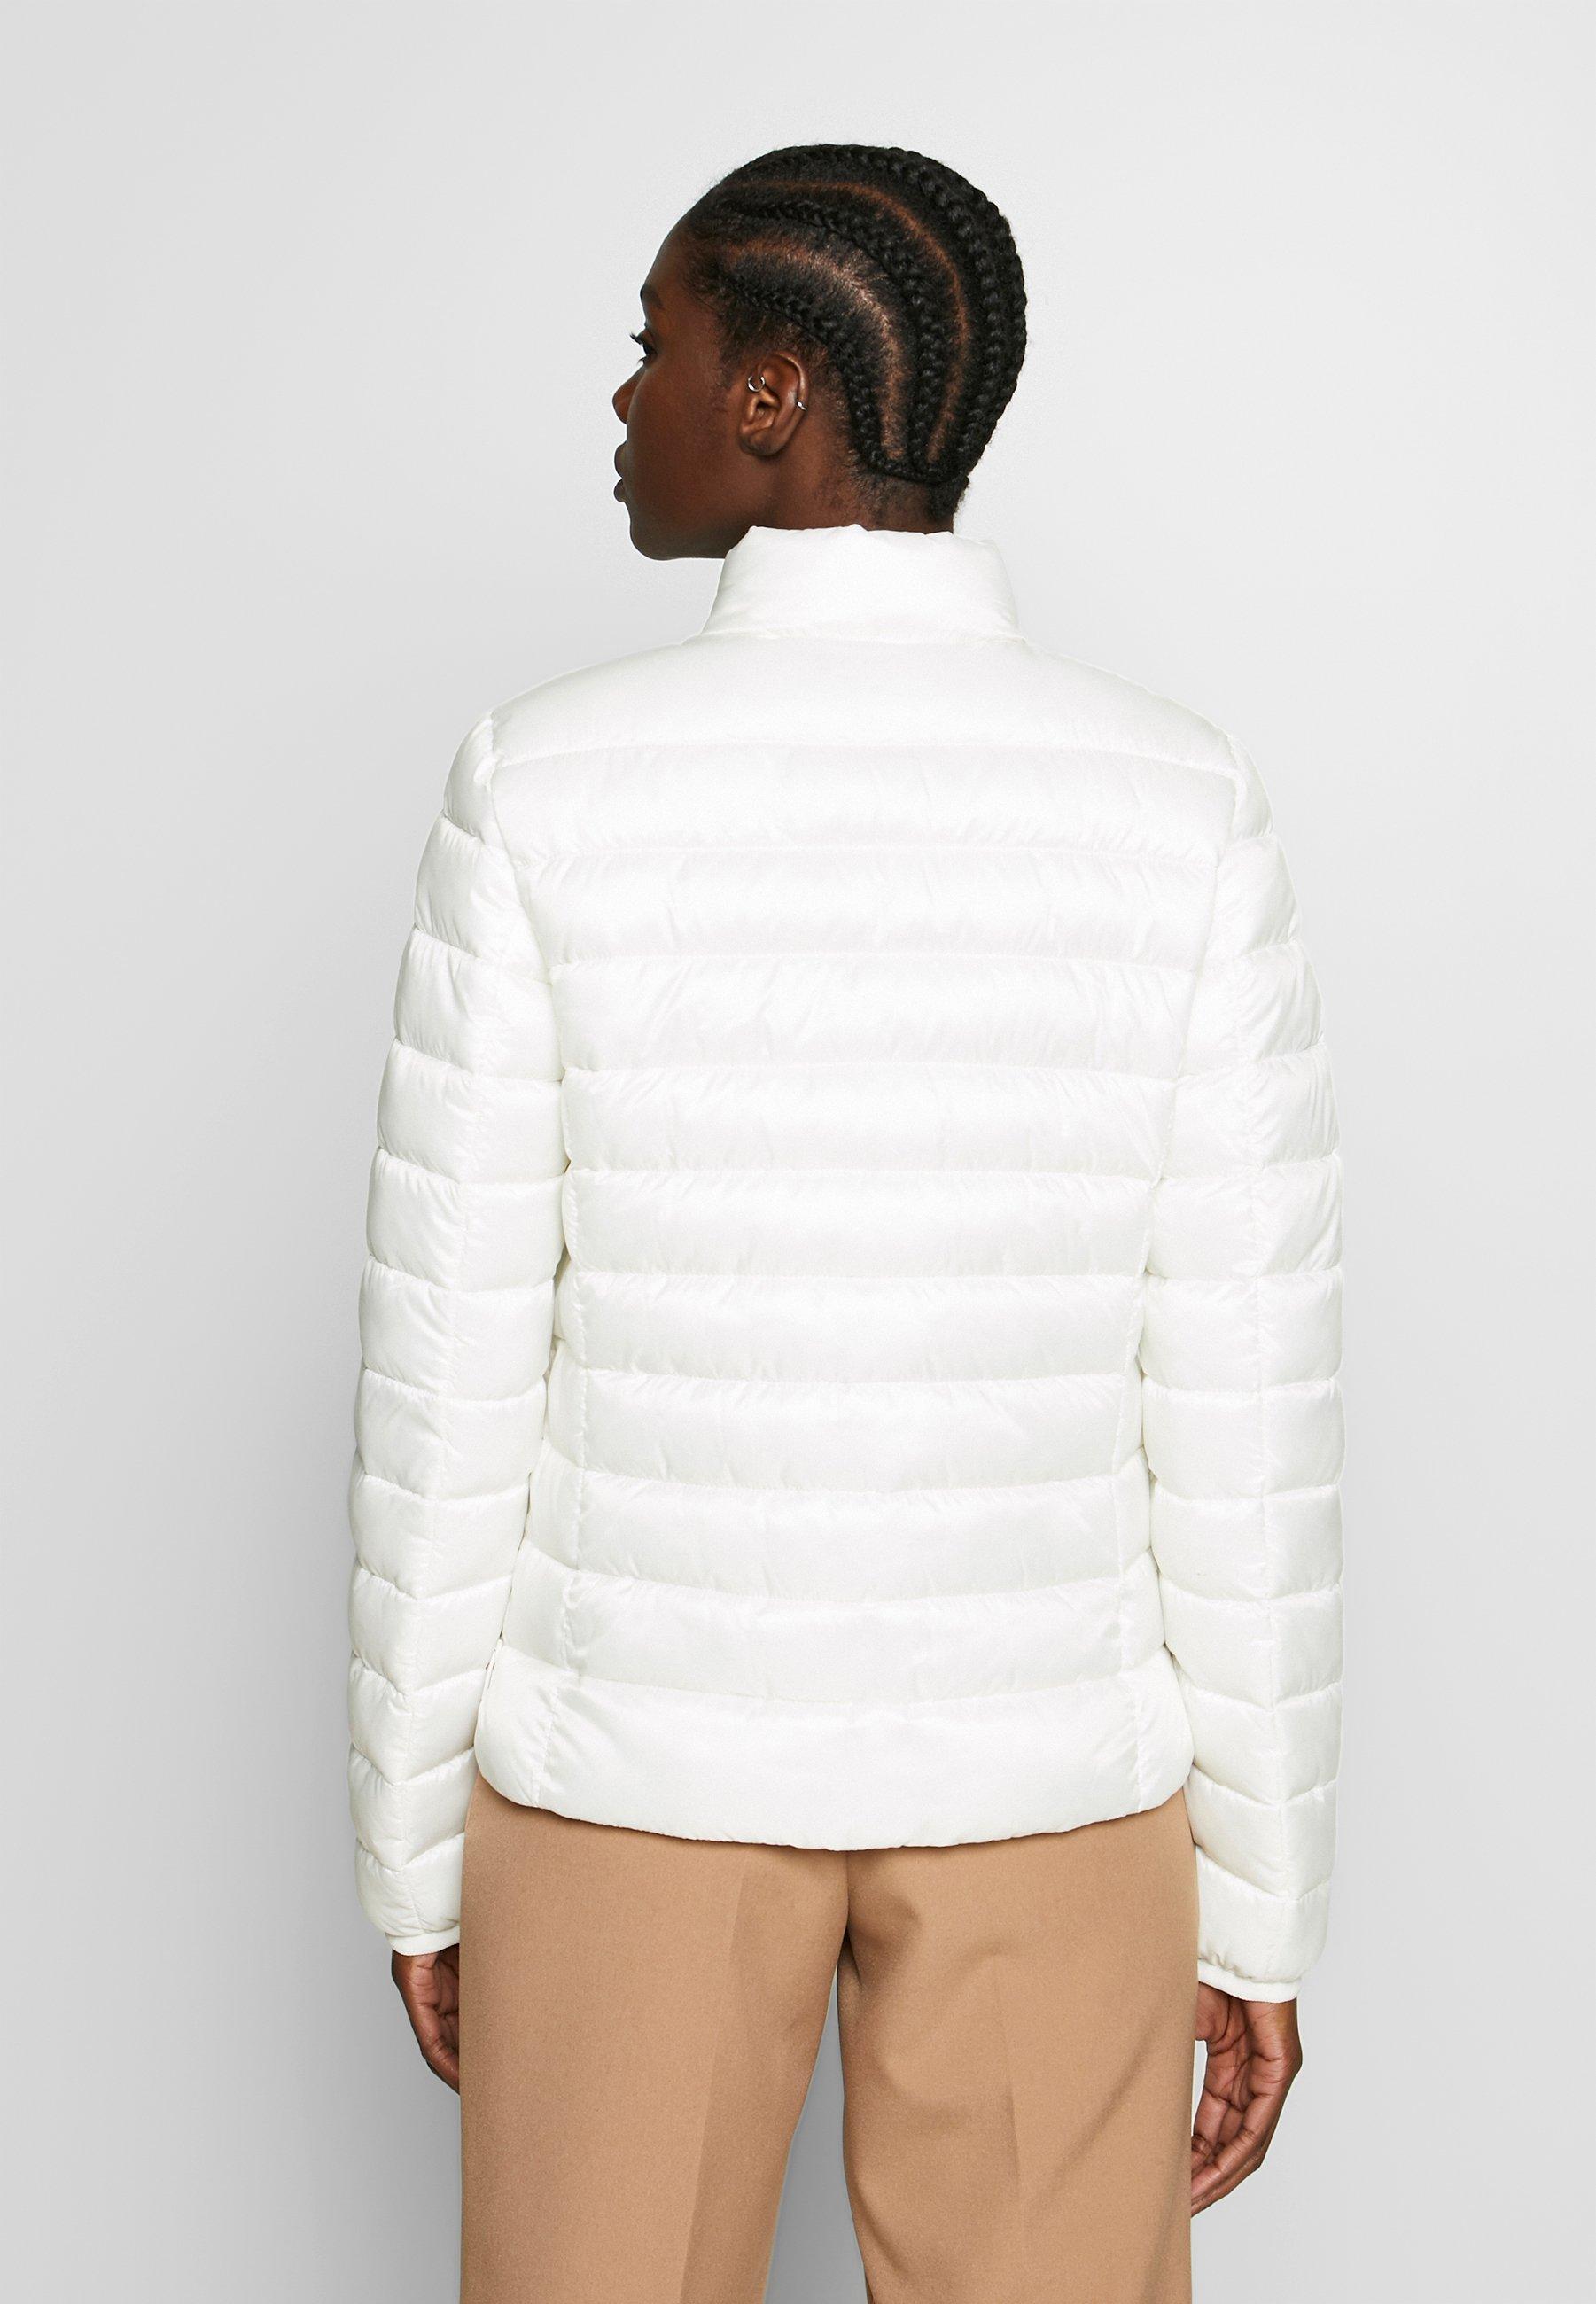 Marc O'Polo NO DOWN SLOW DOWN - Winterjacke - soft white | Damenbekleidung billig